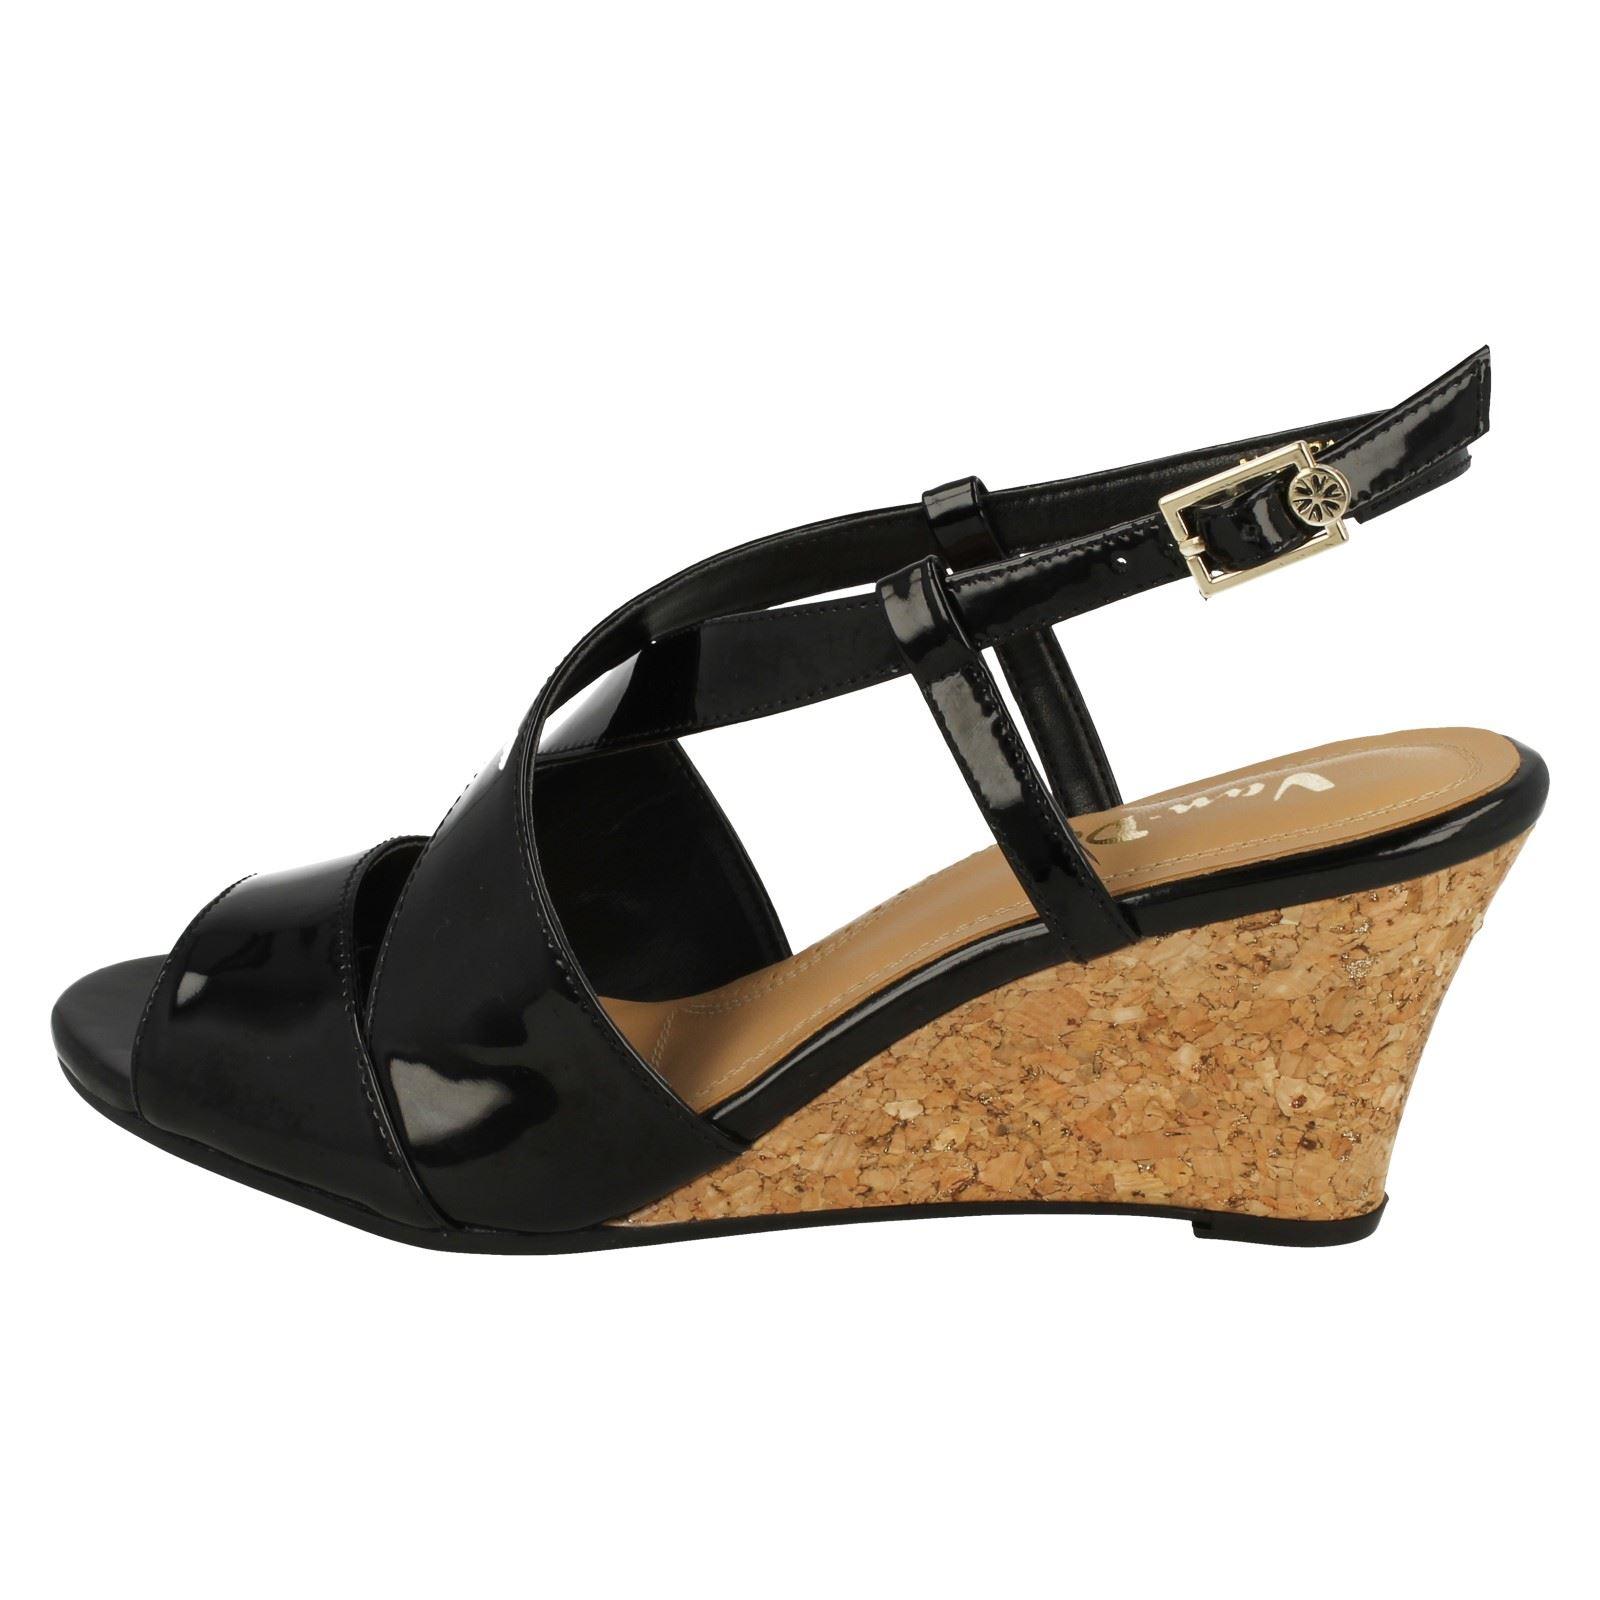 Ladies-Van-Dal-Cross-Strap-Wedged-Sandal-Allora thumbnail 12